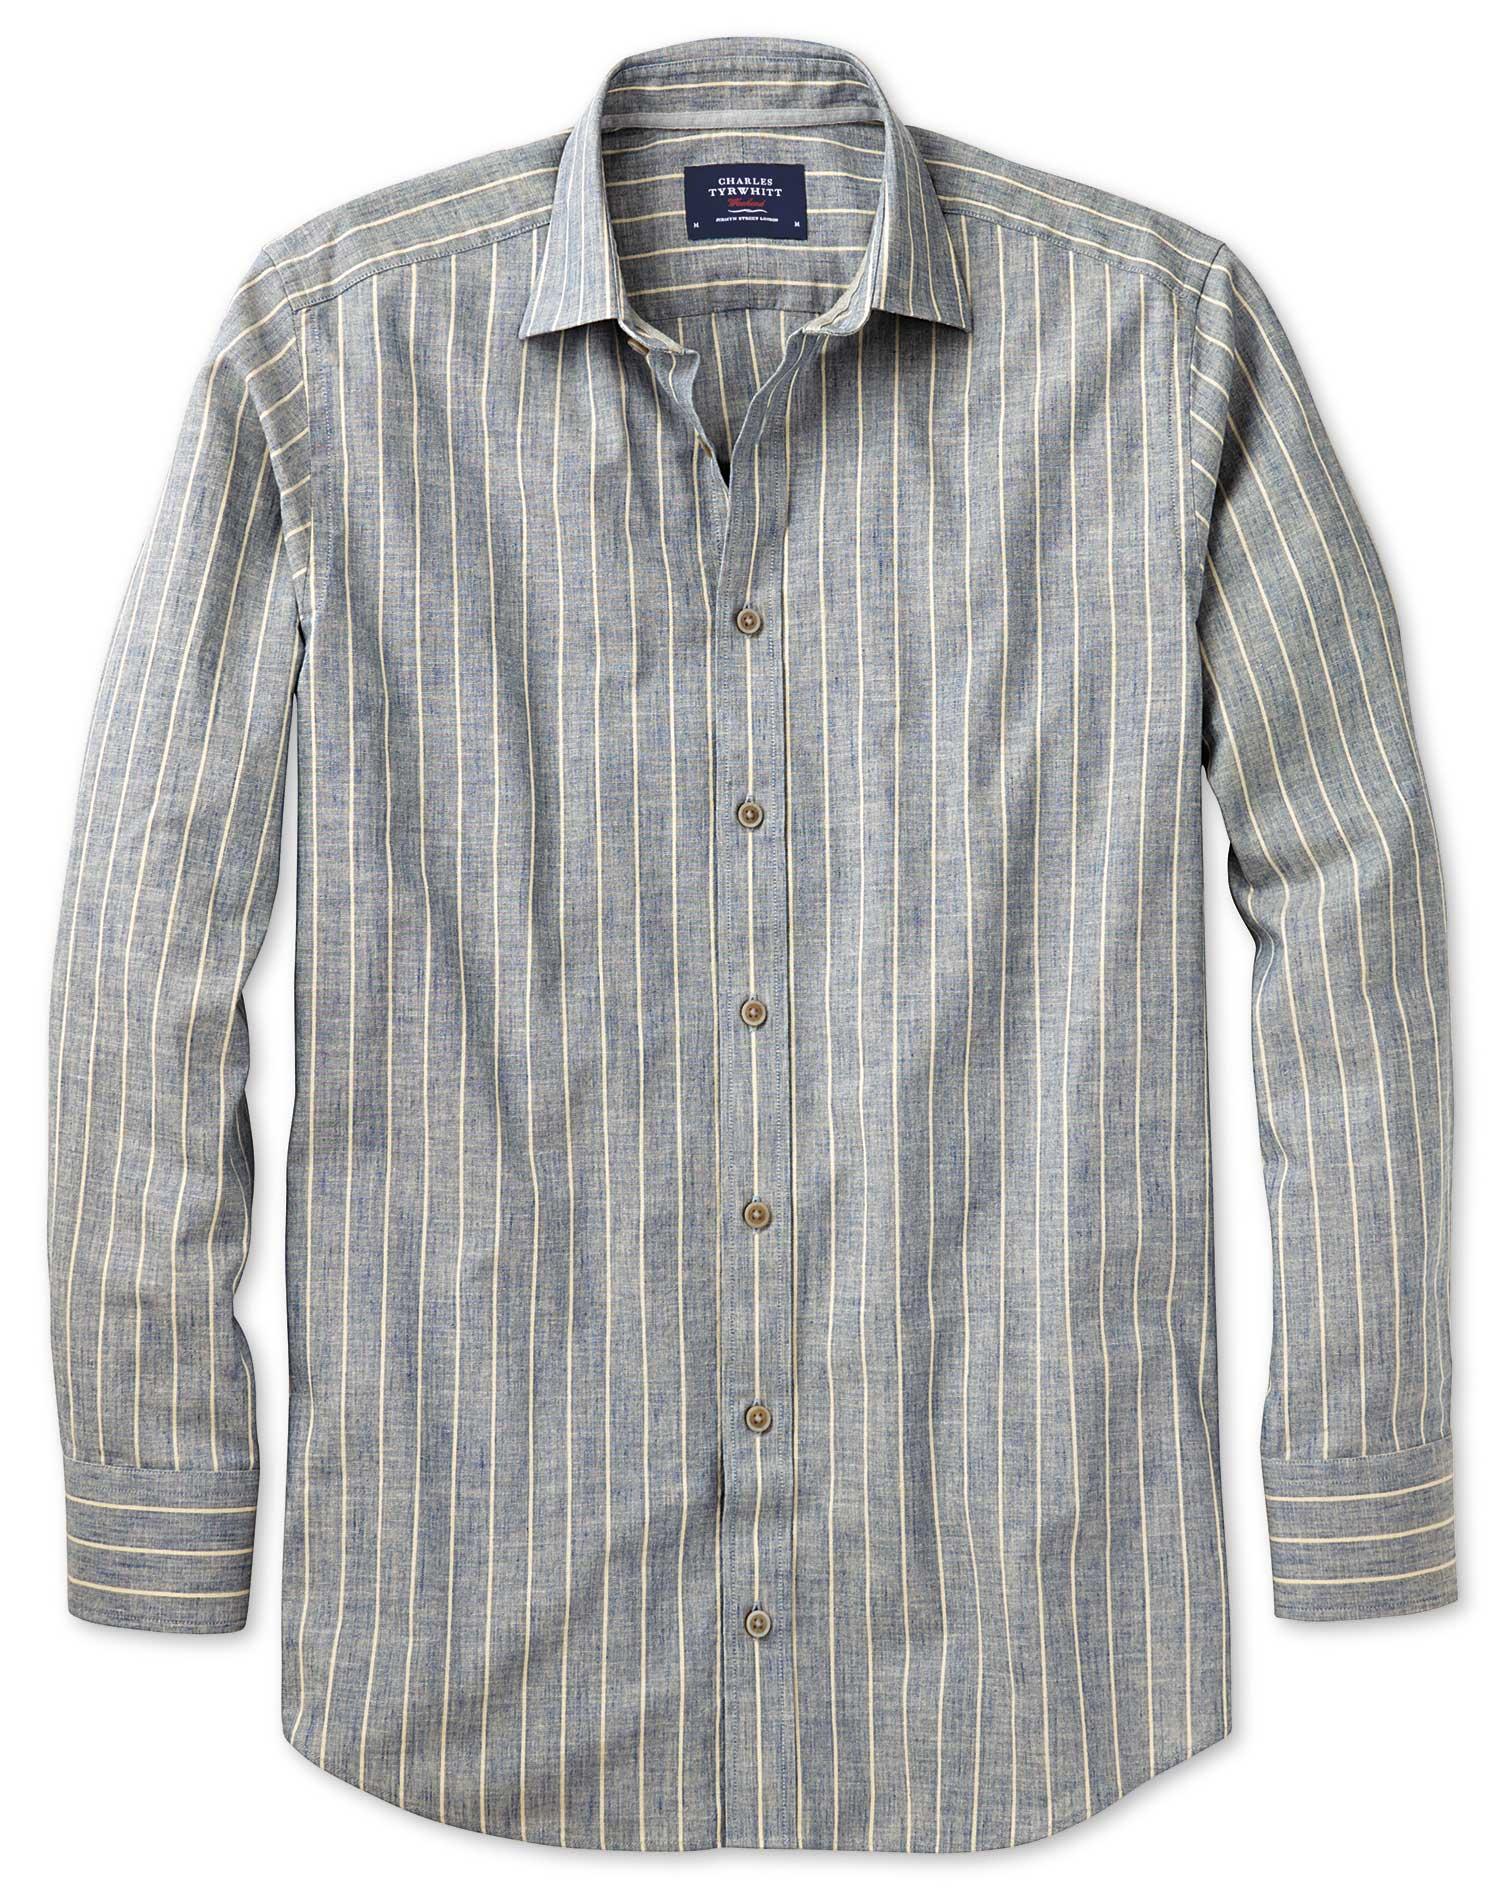 Slim Fit Denim Blue Stripe Textured Cotton Shirt Single Cuff Size XS by Charles Tyrwhitt